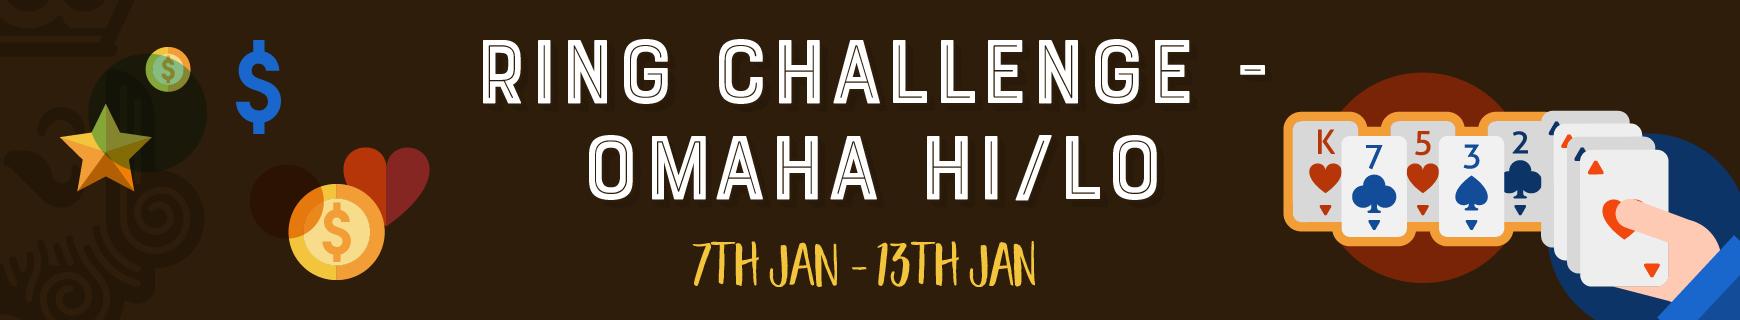 Ring Challenge - Omaha Hi/Lo · Replay Poker